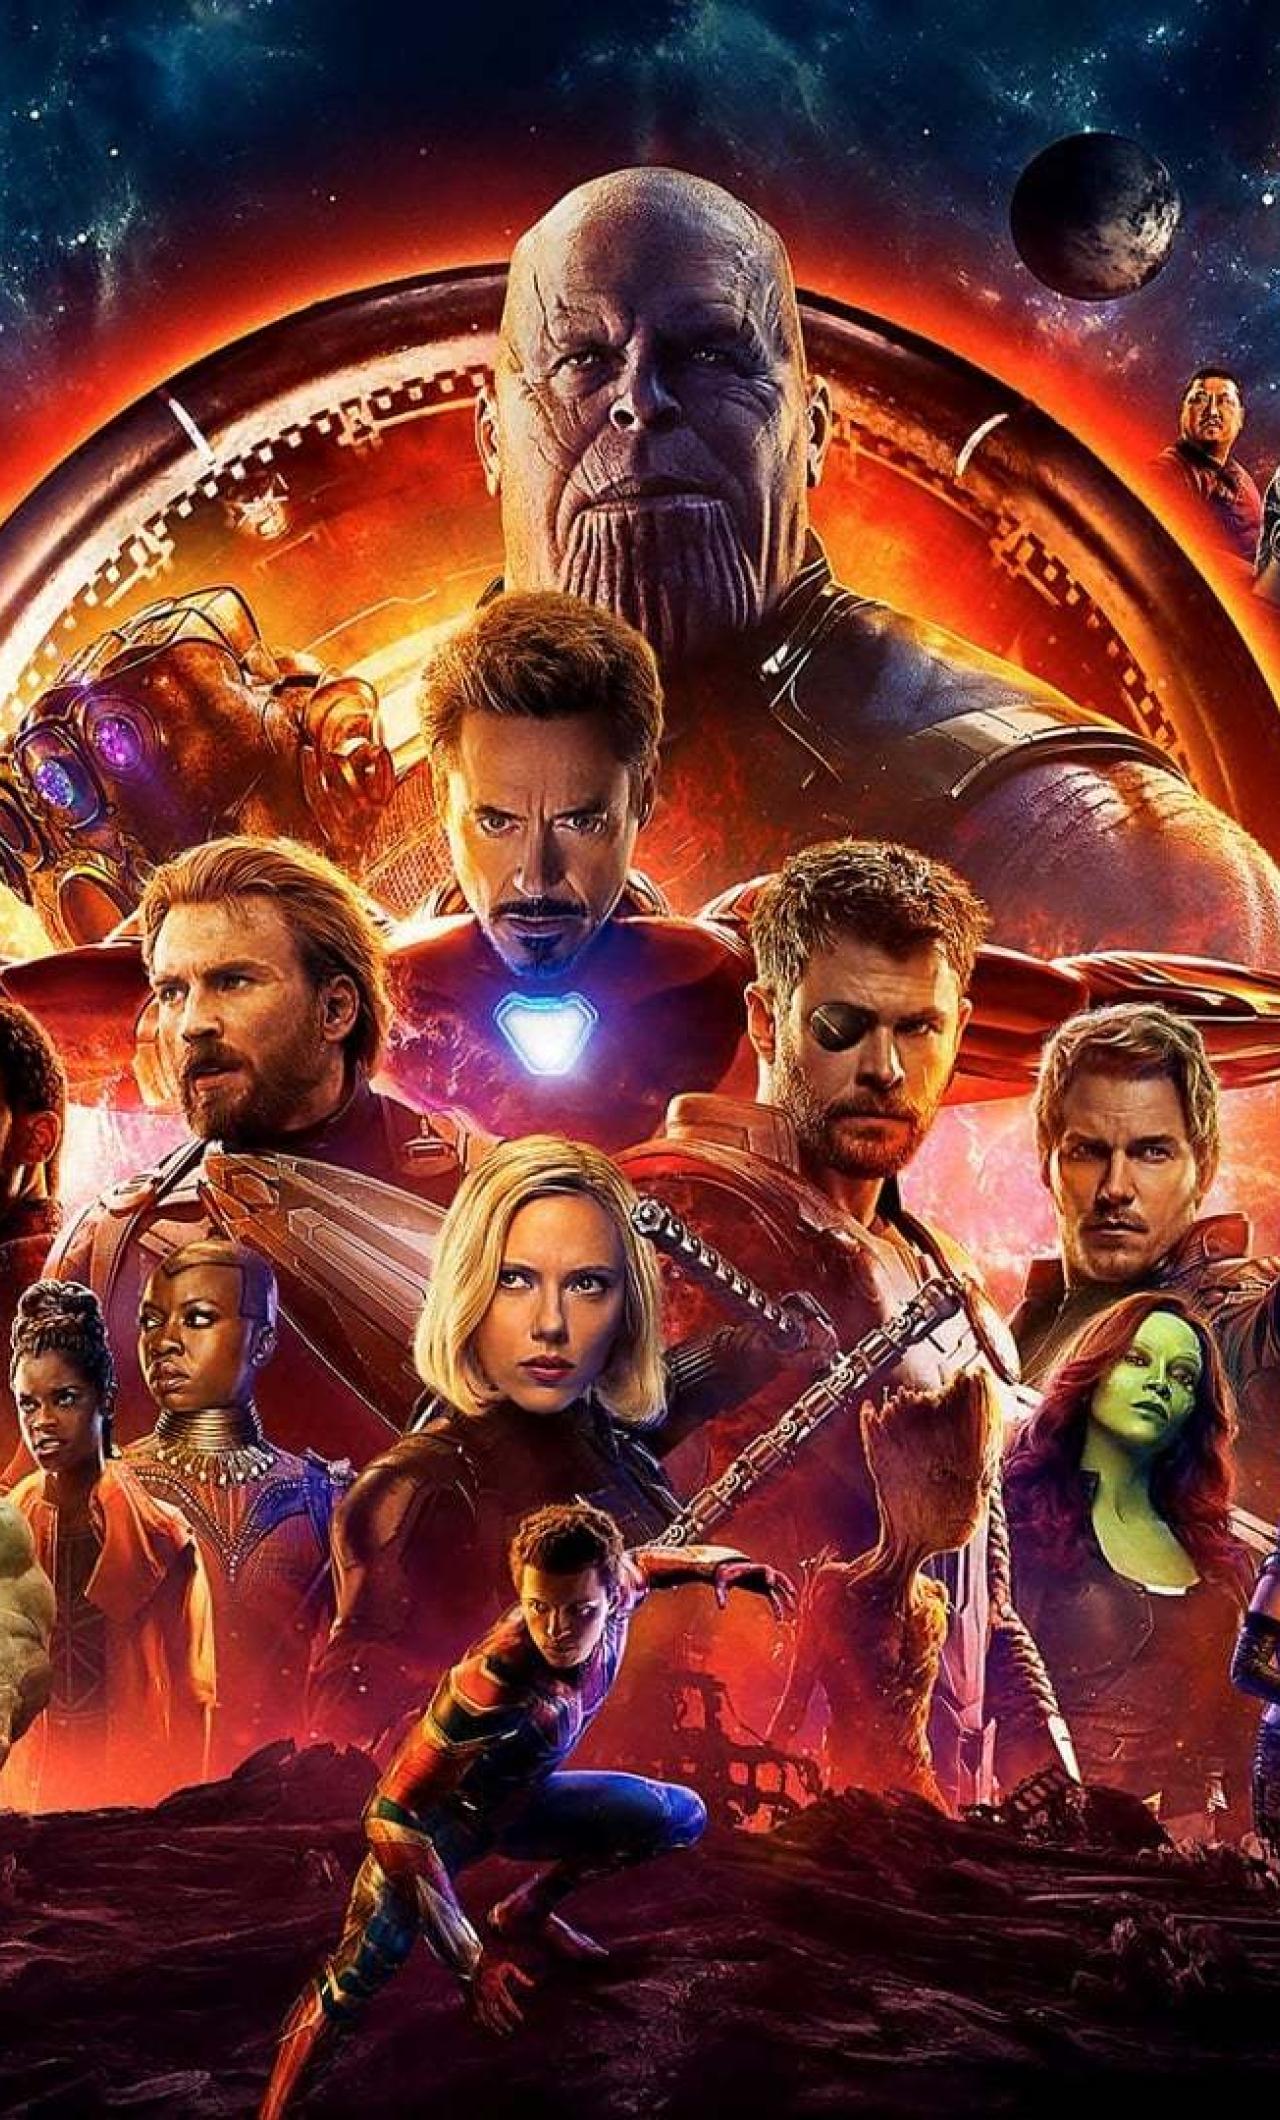 Avengers infinity war official poster full hd wallpaper - Avengers infinity war wallpaper iphone ...